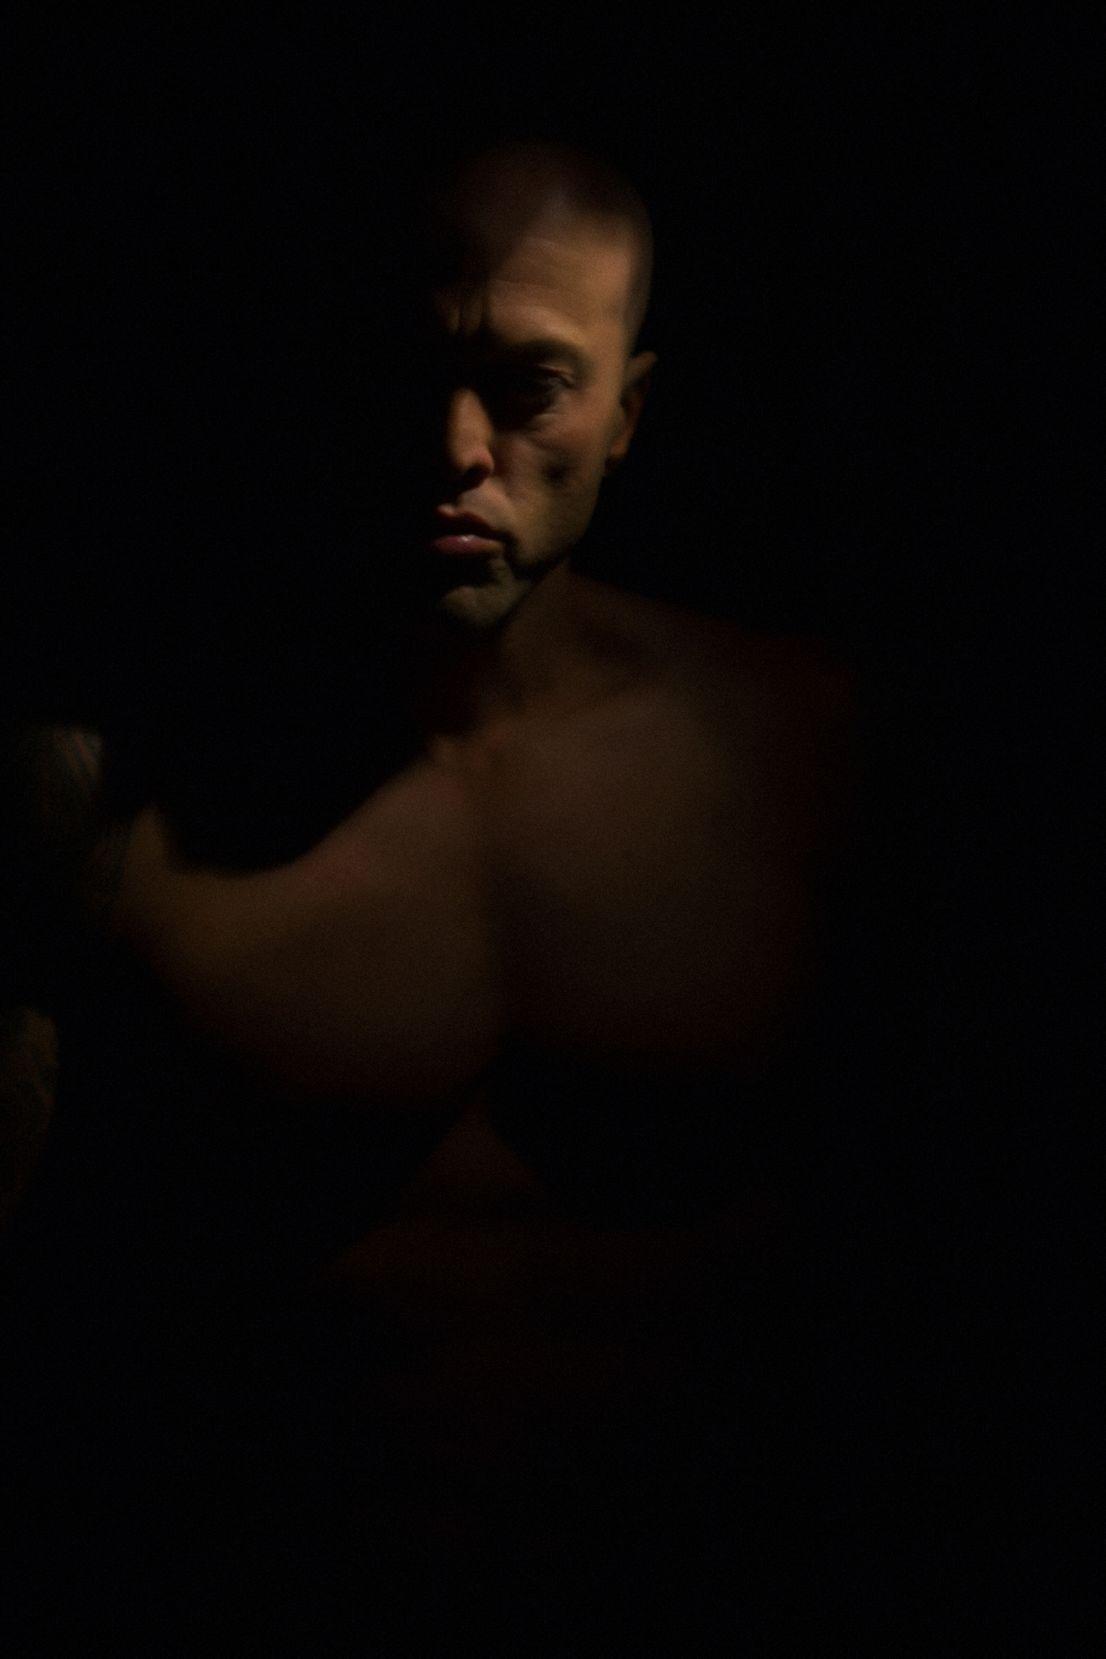 Actor & Model John Joseph Quinlan Photo by Brianna Oliveira #JohnQuinlan